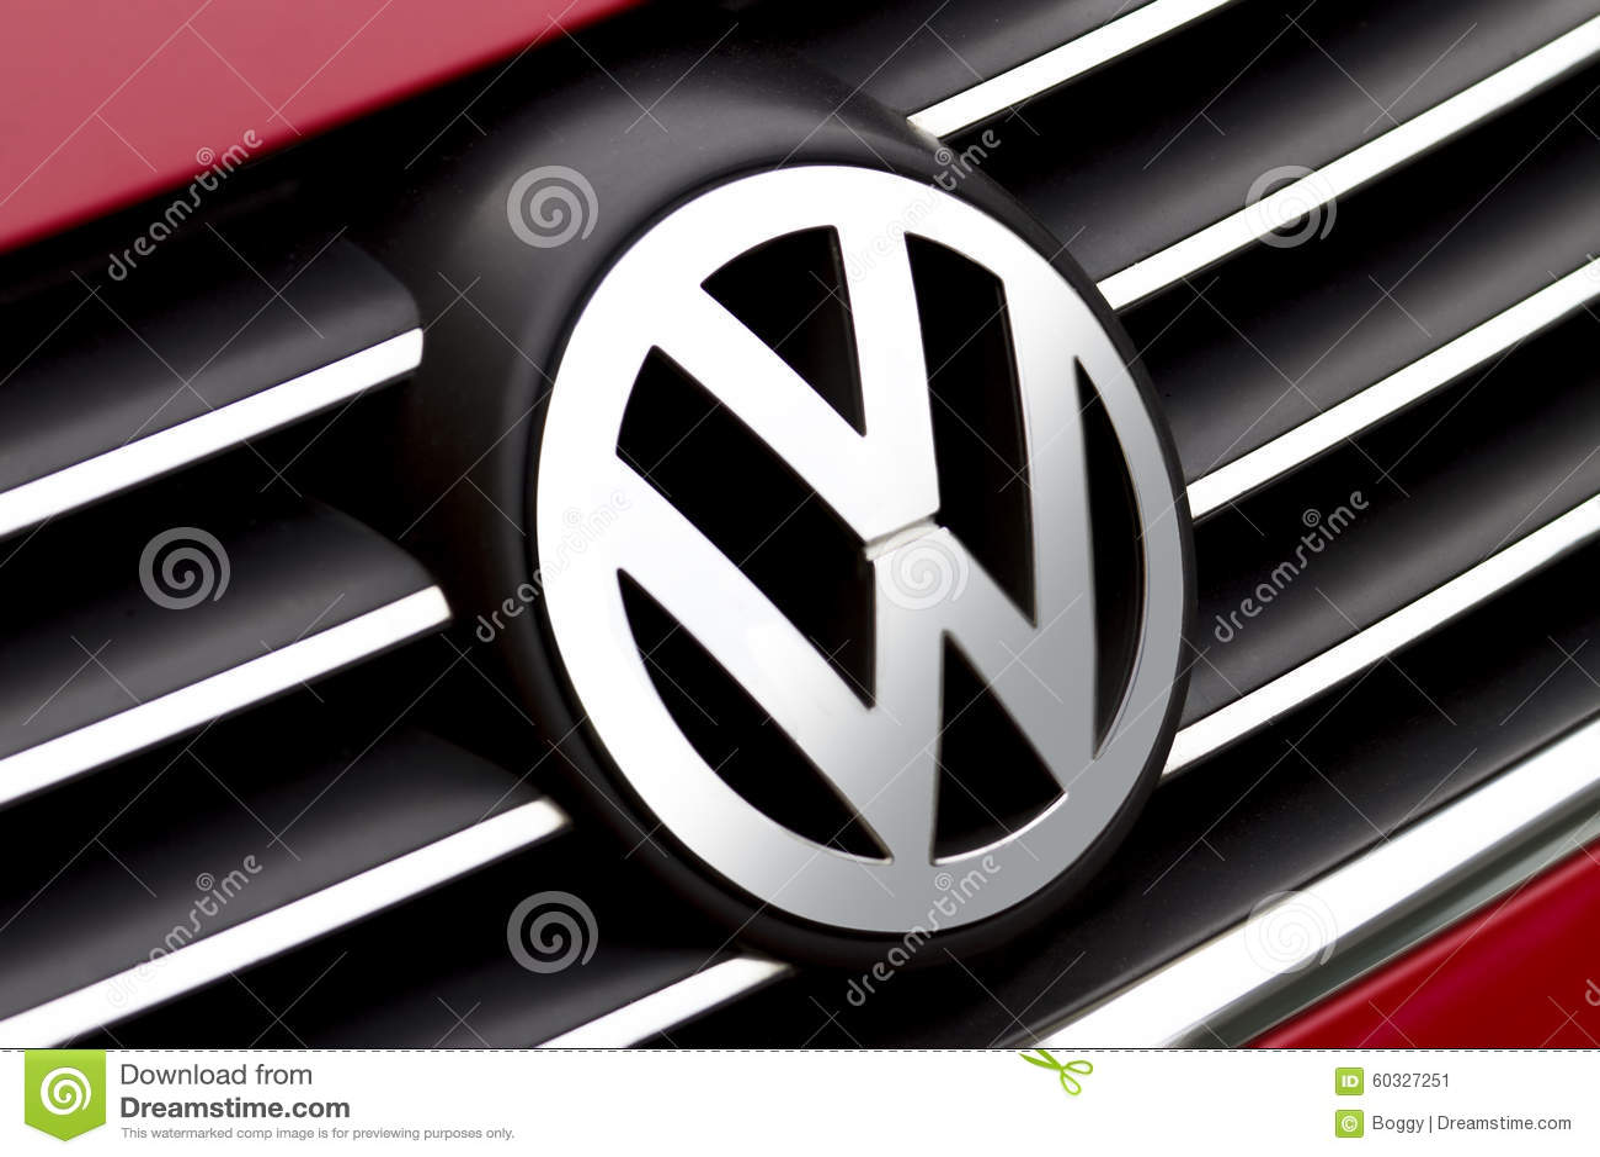 Volkswagen Sign Editorial Photo Image 60327251